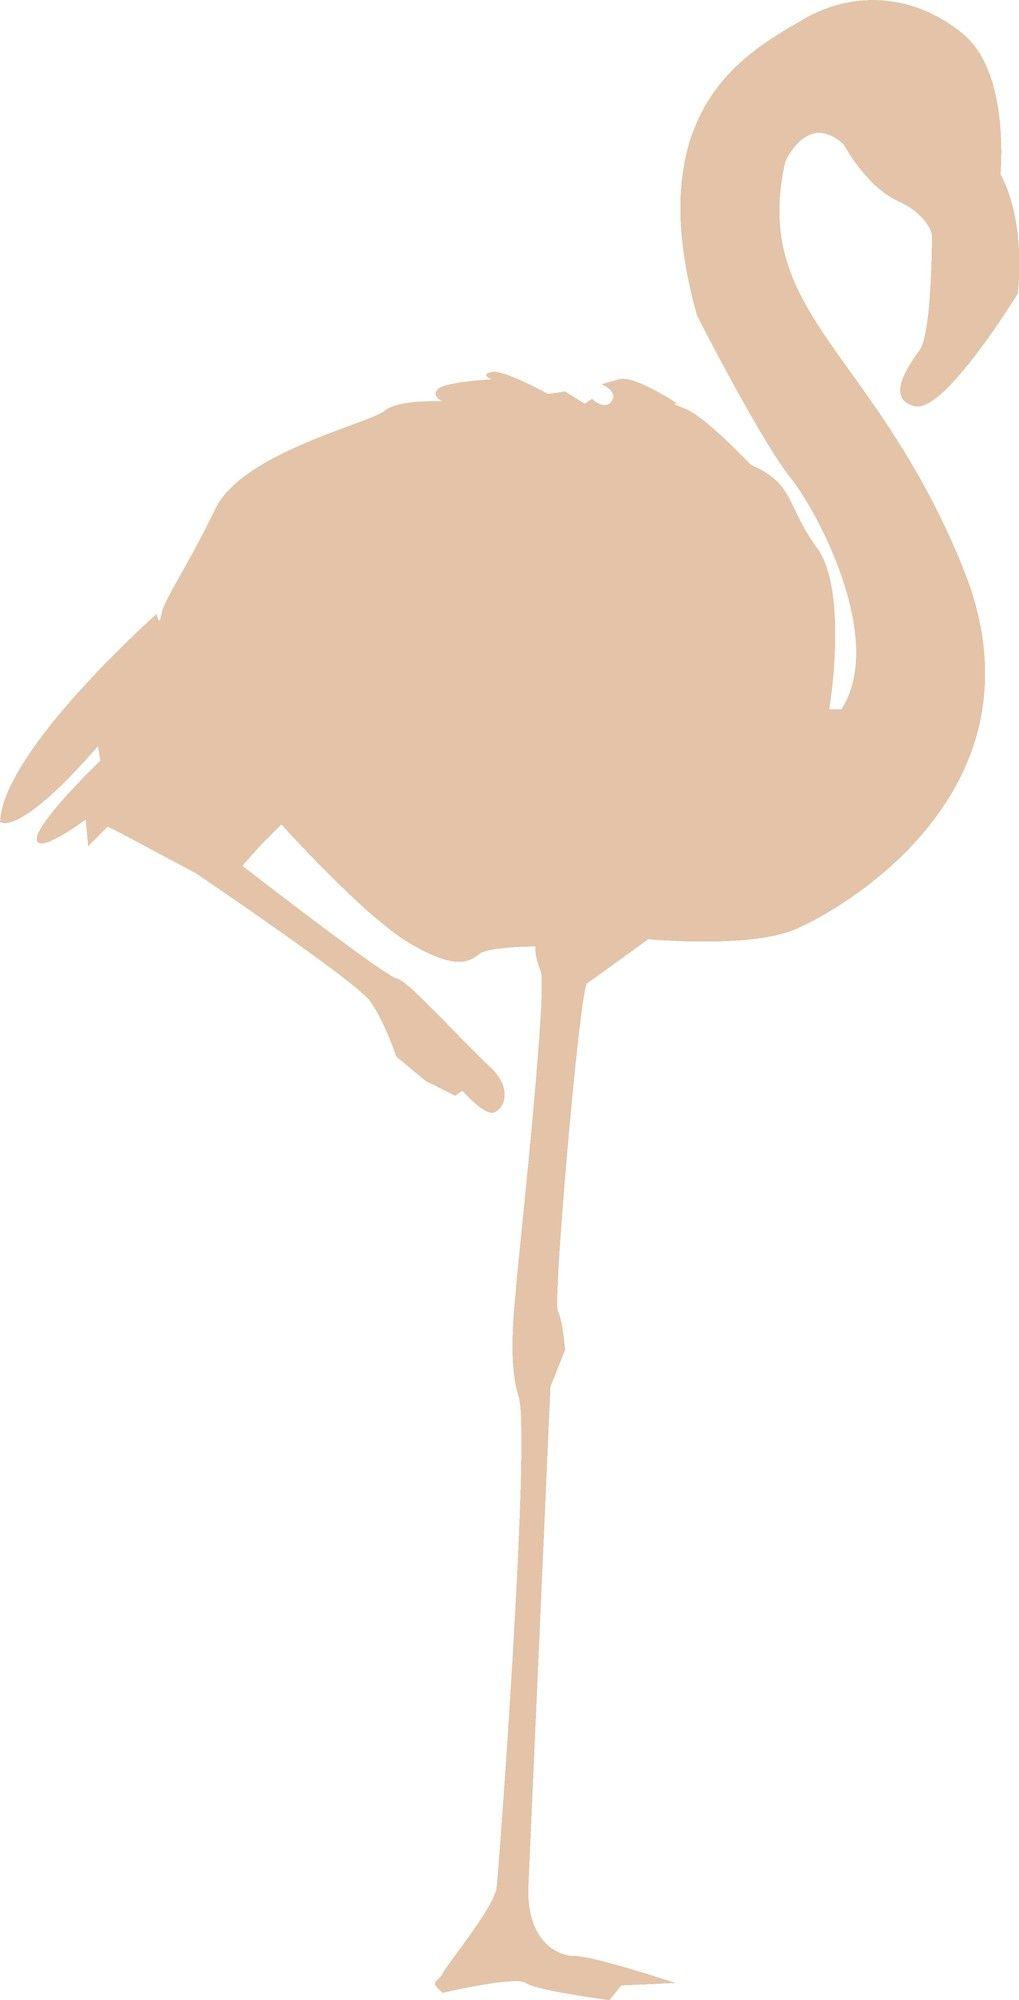 Flamingo Sihouette Cutout Wall Decal